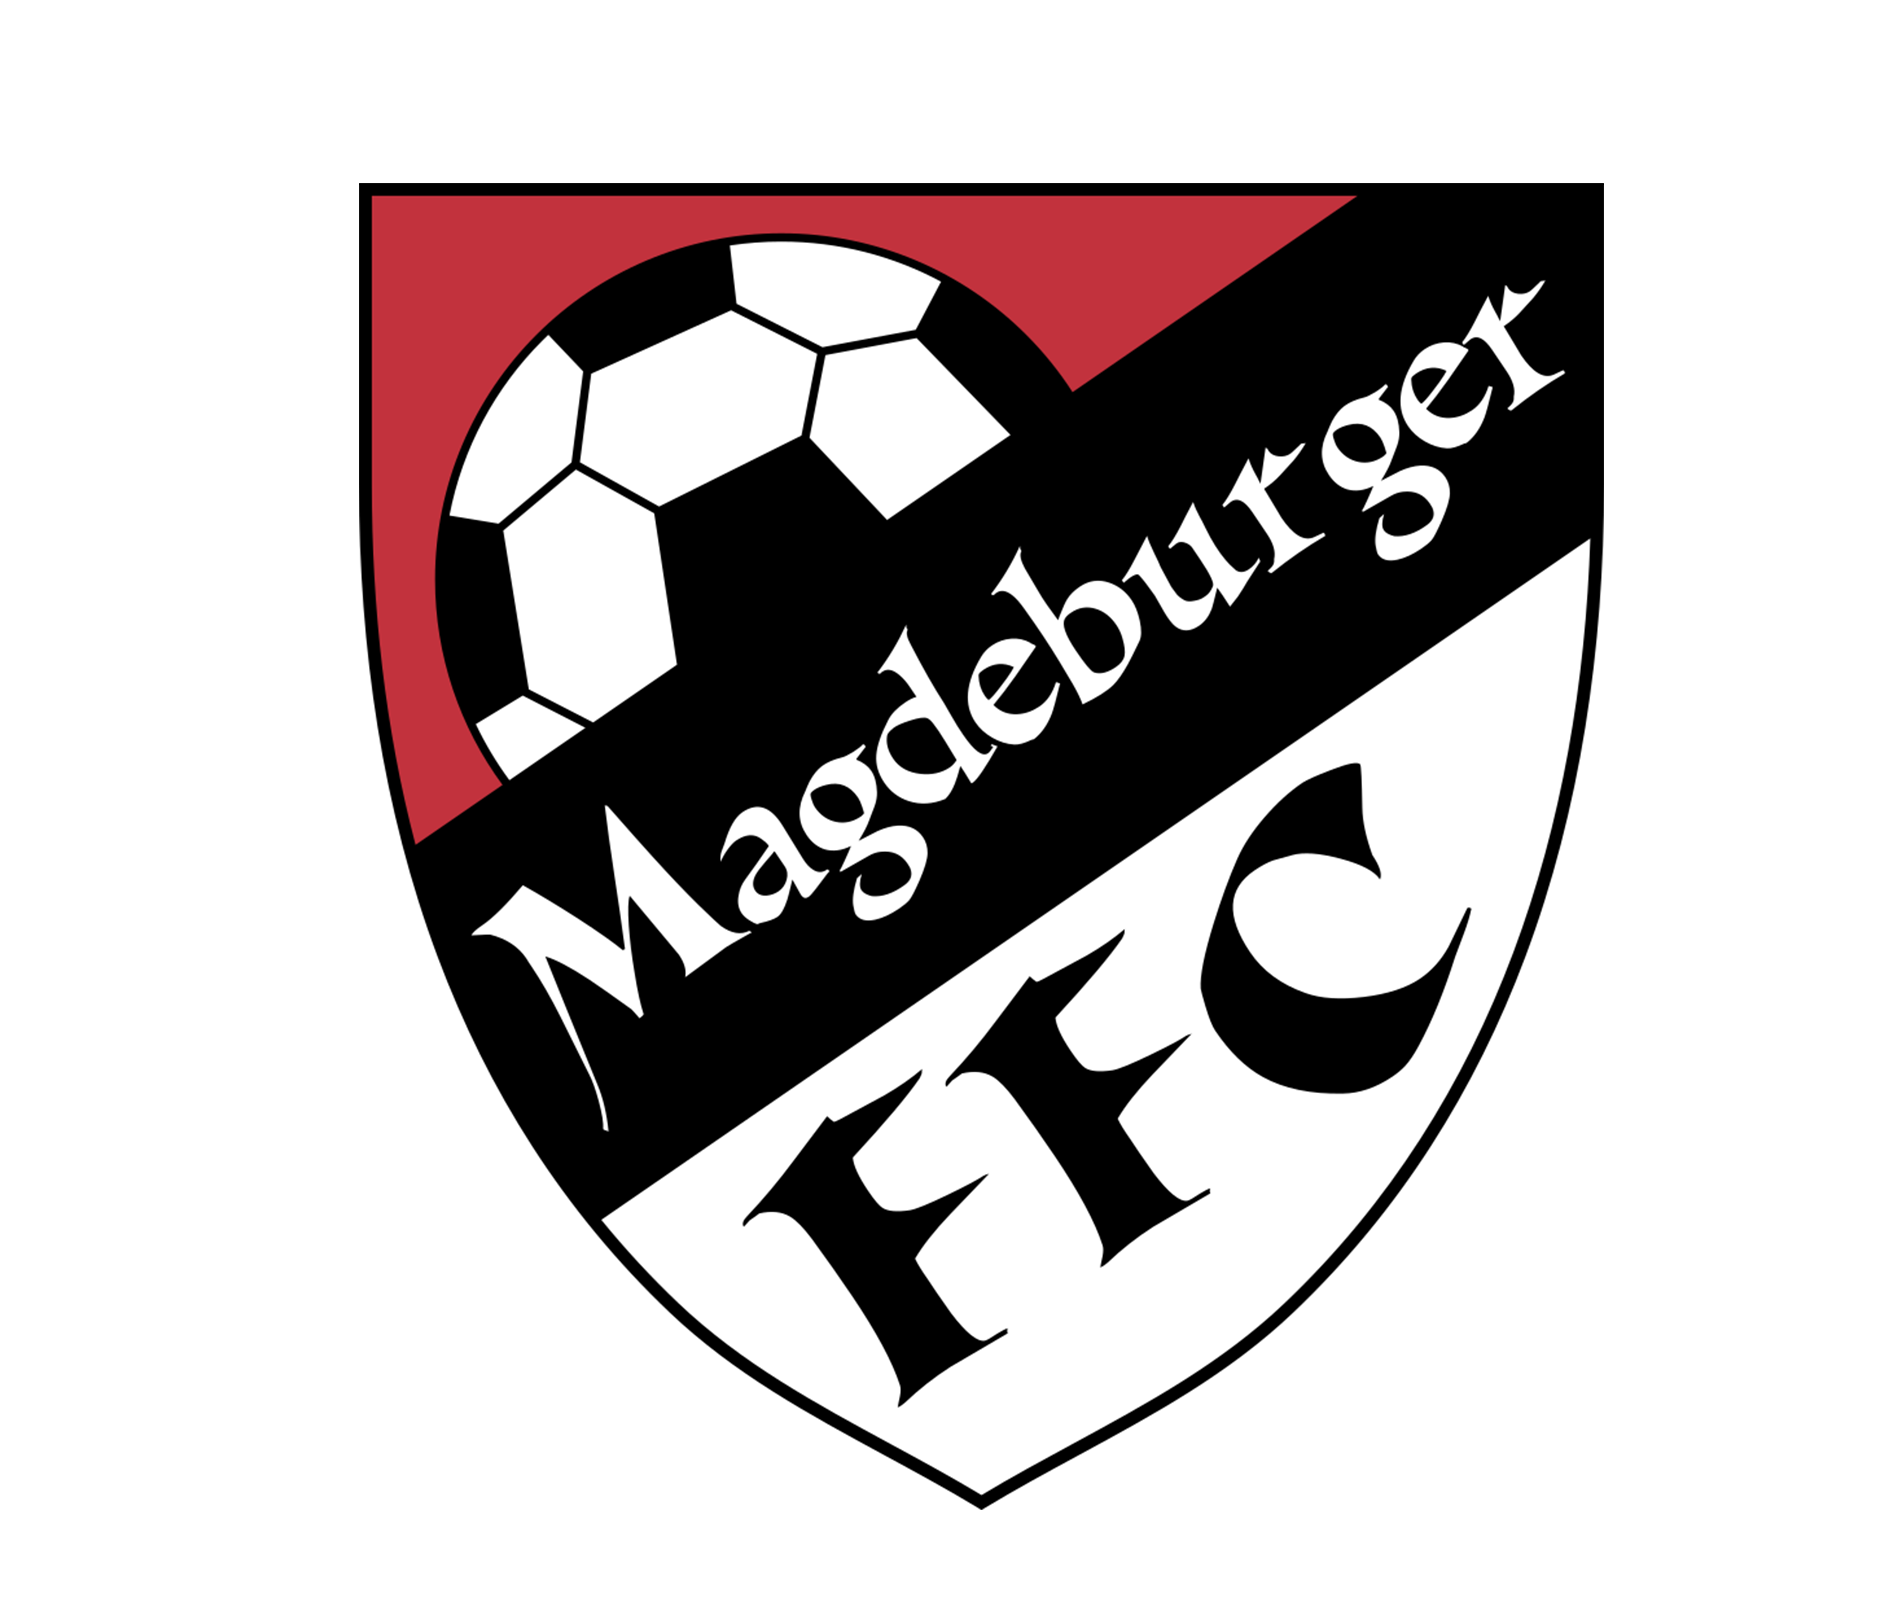 MFFC Magdeburger Frauen Fussballclub